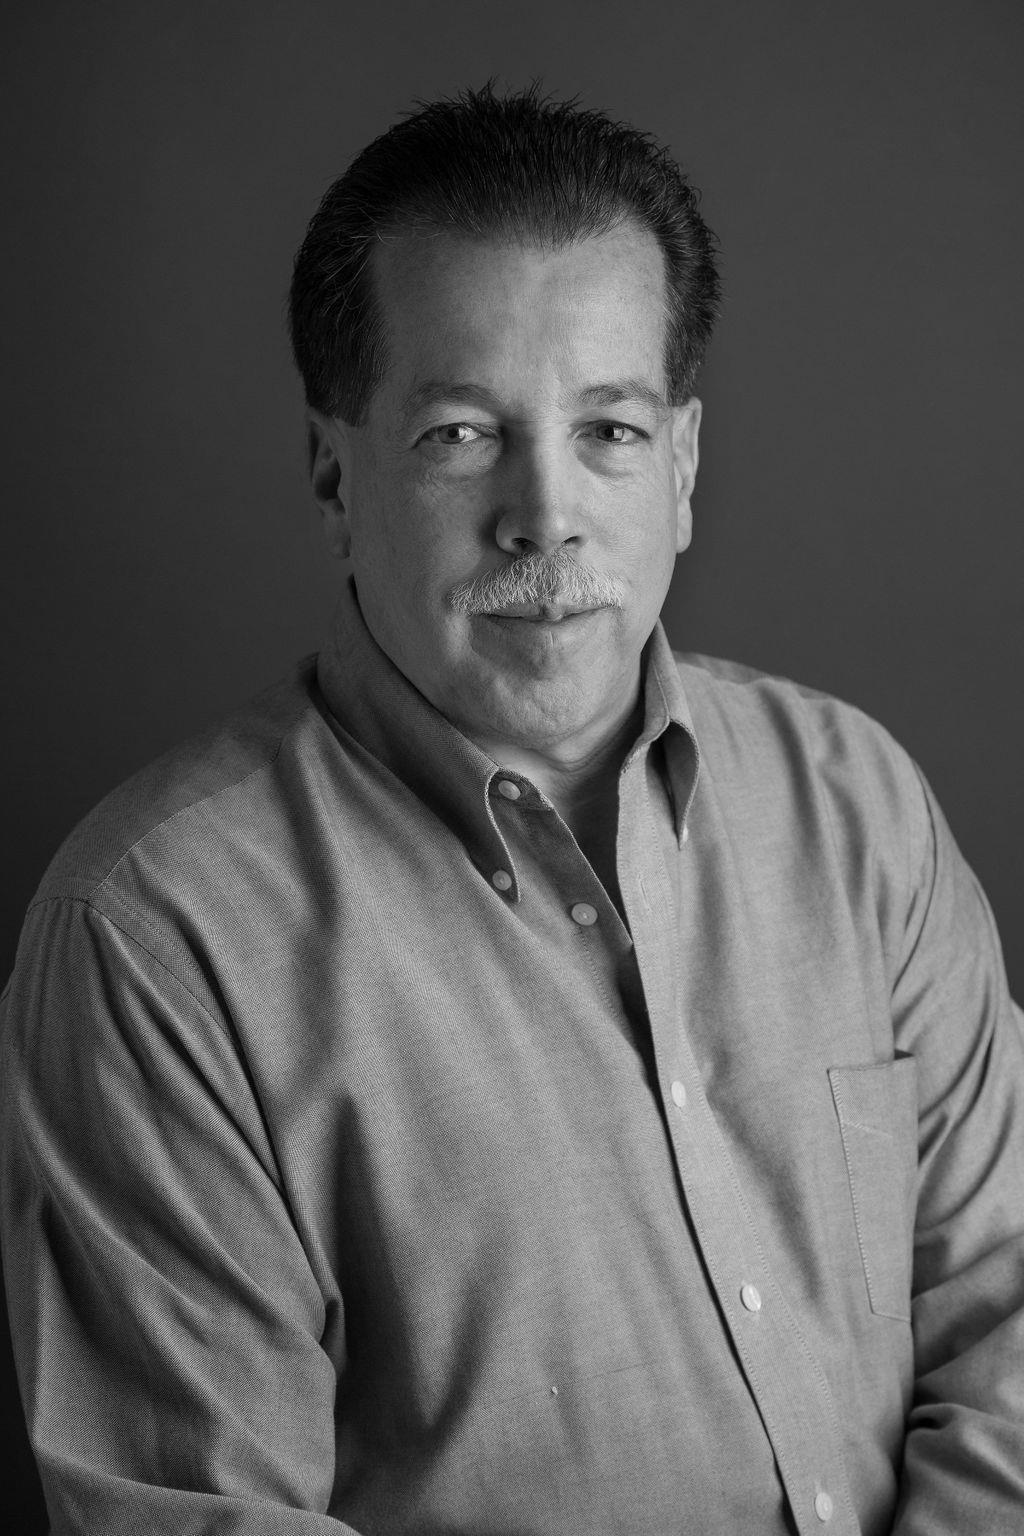 Joseph Sclafani